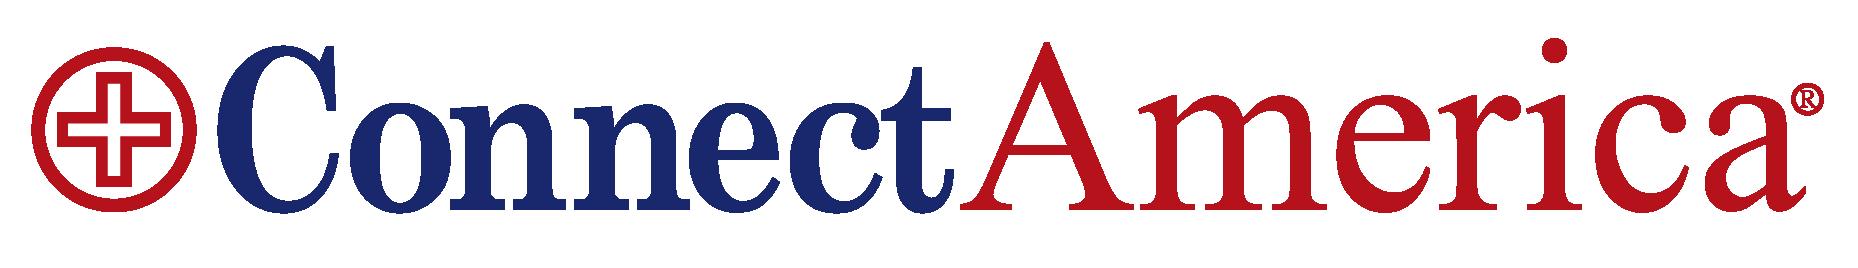 ConnectAmerica_-01 1.29.19 - Copy